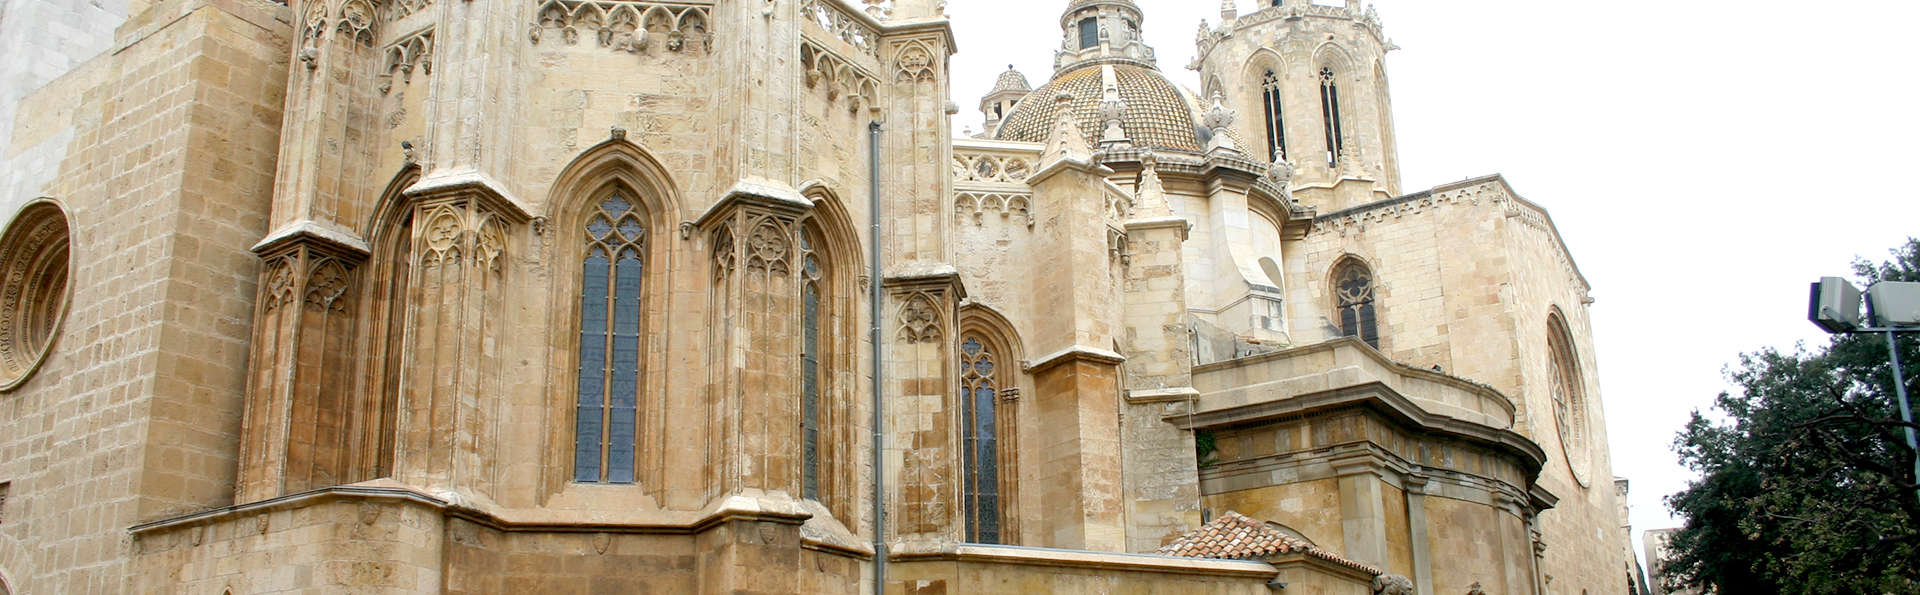 Hotel SB Ciutat de Tarragona - Edit_Tarragona2.jpg